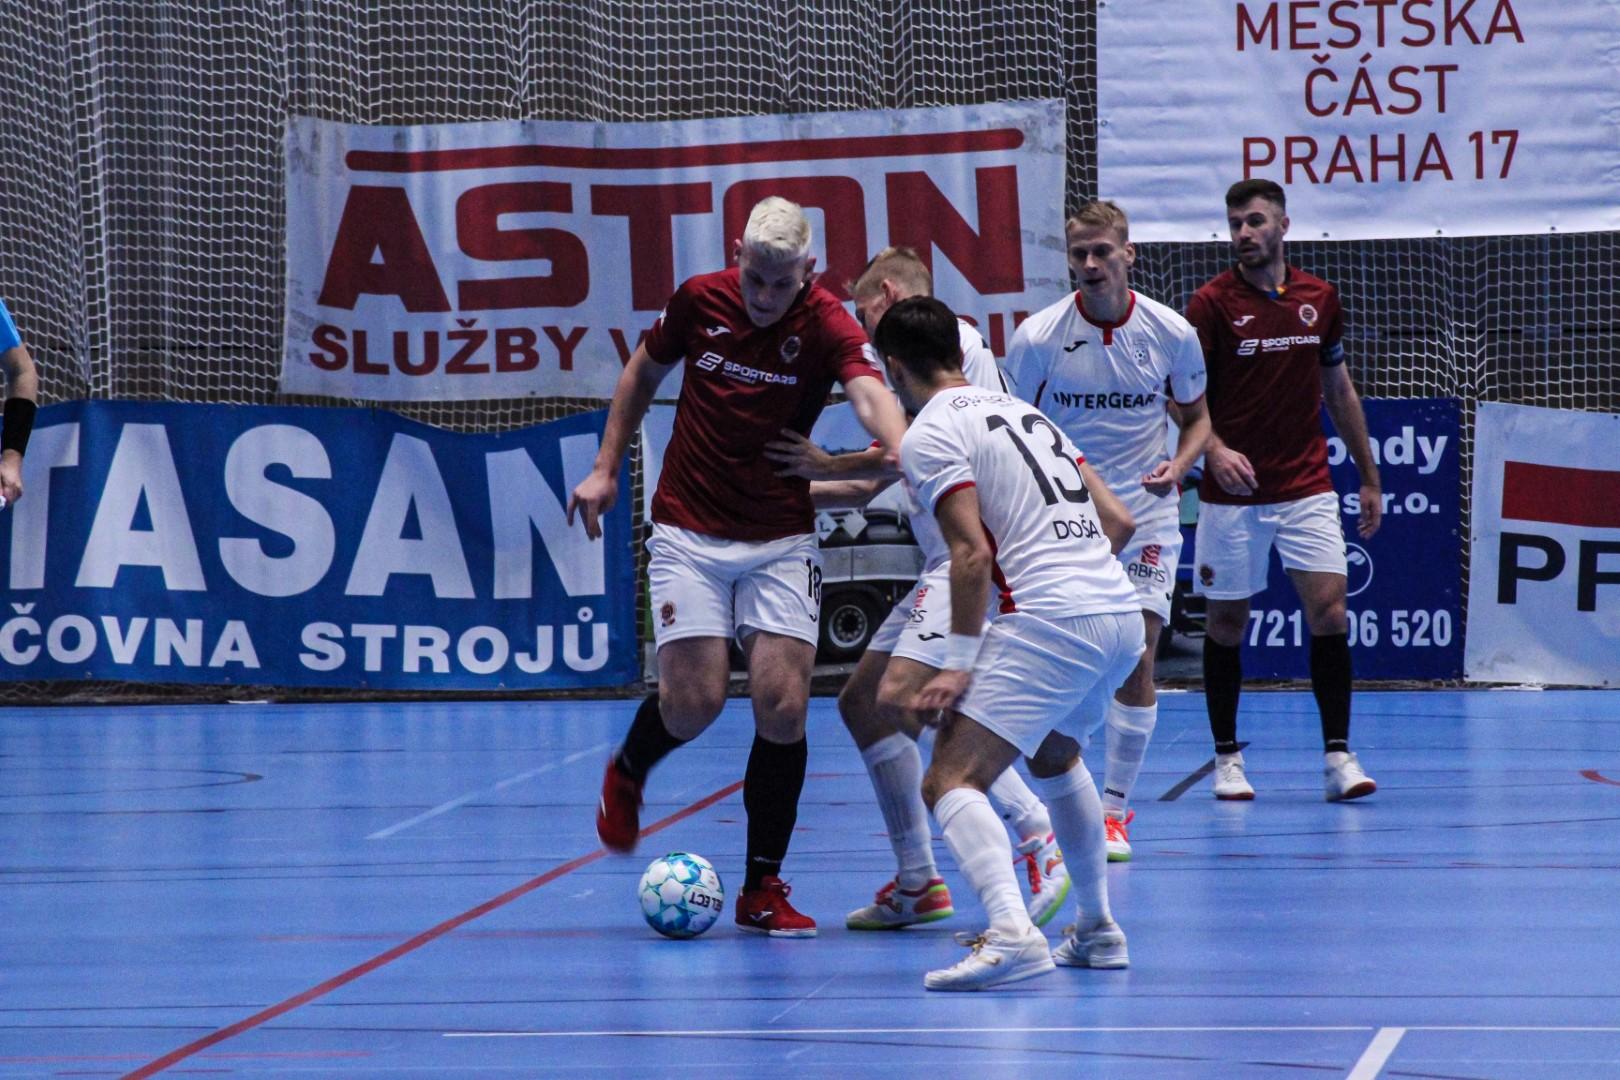 Sparťané v Teplicích bojovali, ale do čtvrtfinále nepostupují